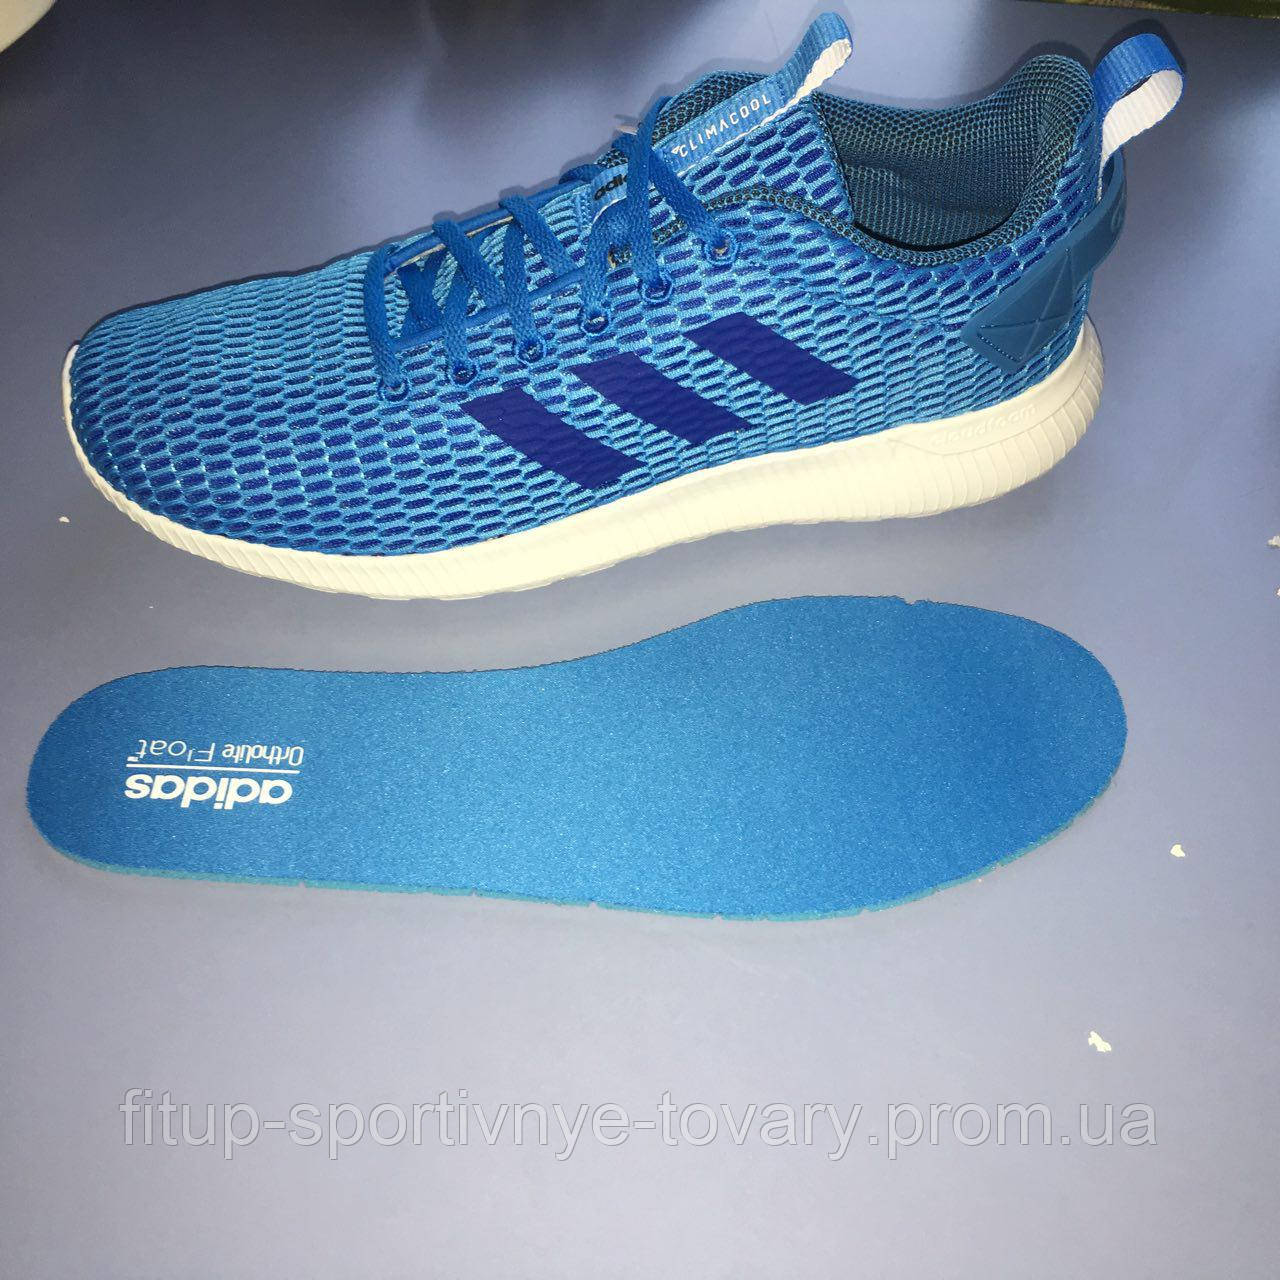 81b60c45 Кроссовки мужские Adidas CF LITE RACER CC DB1588: продажа, цена в ...